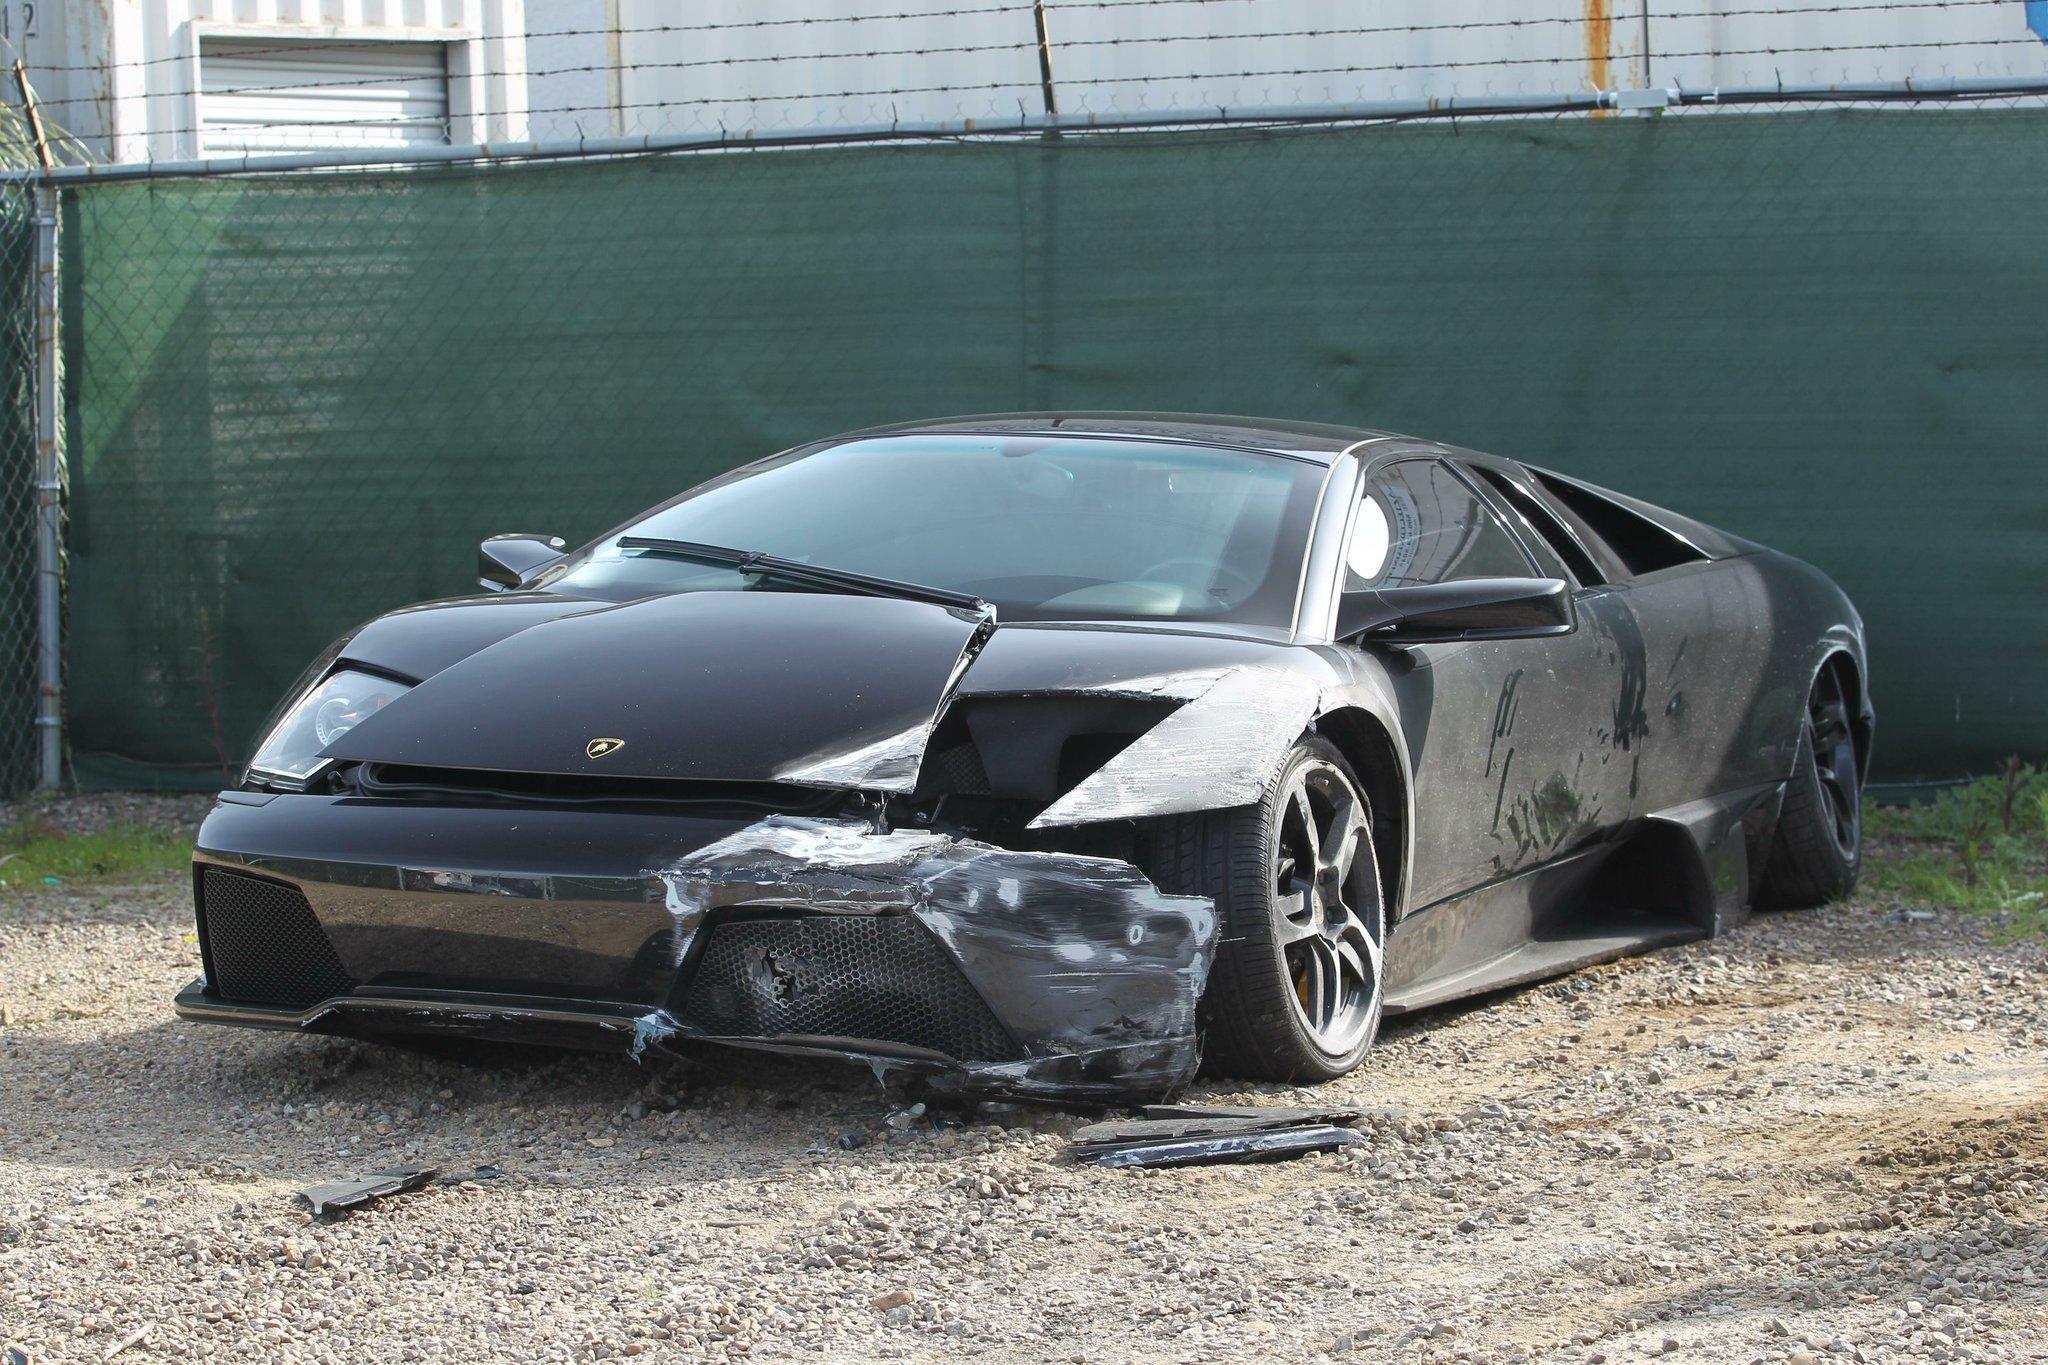 Lamborghini Newport Beach >> Crashed Lamborghini still not claimed - The San Diego ...